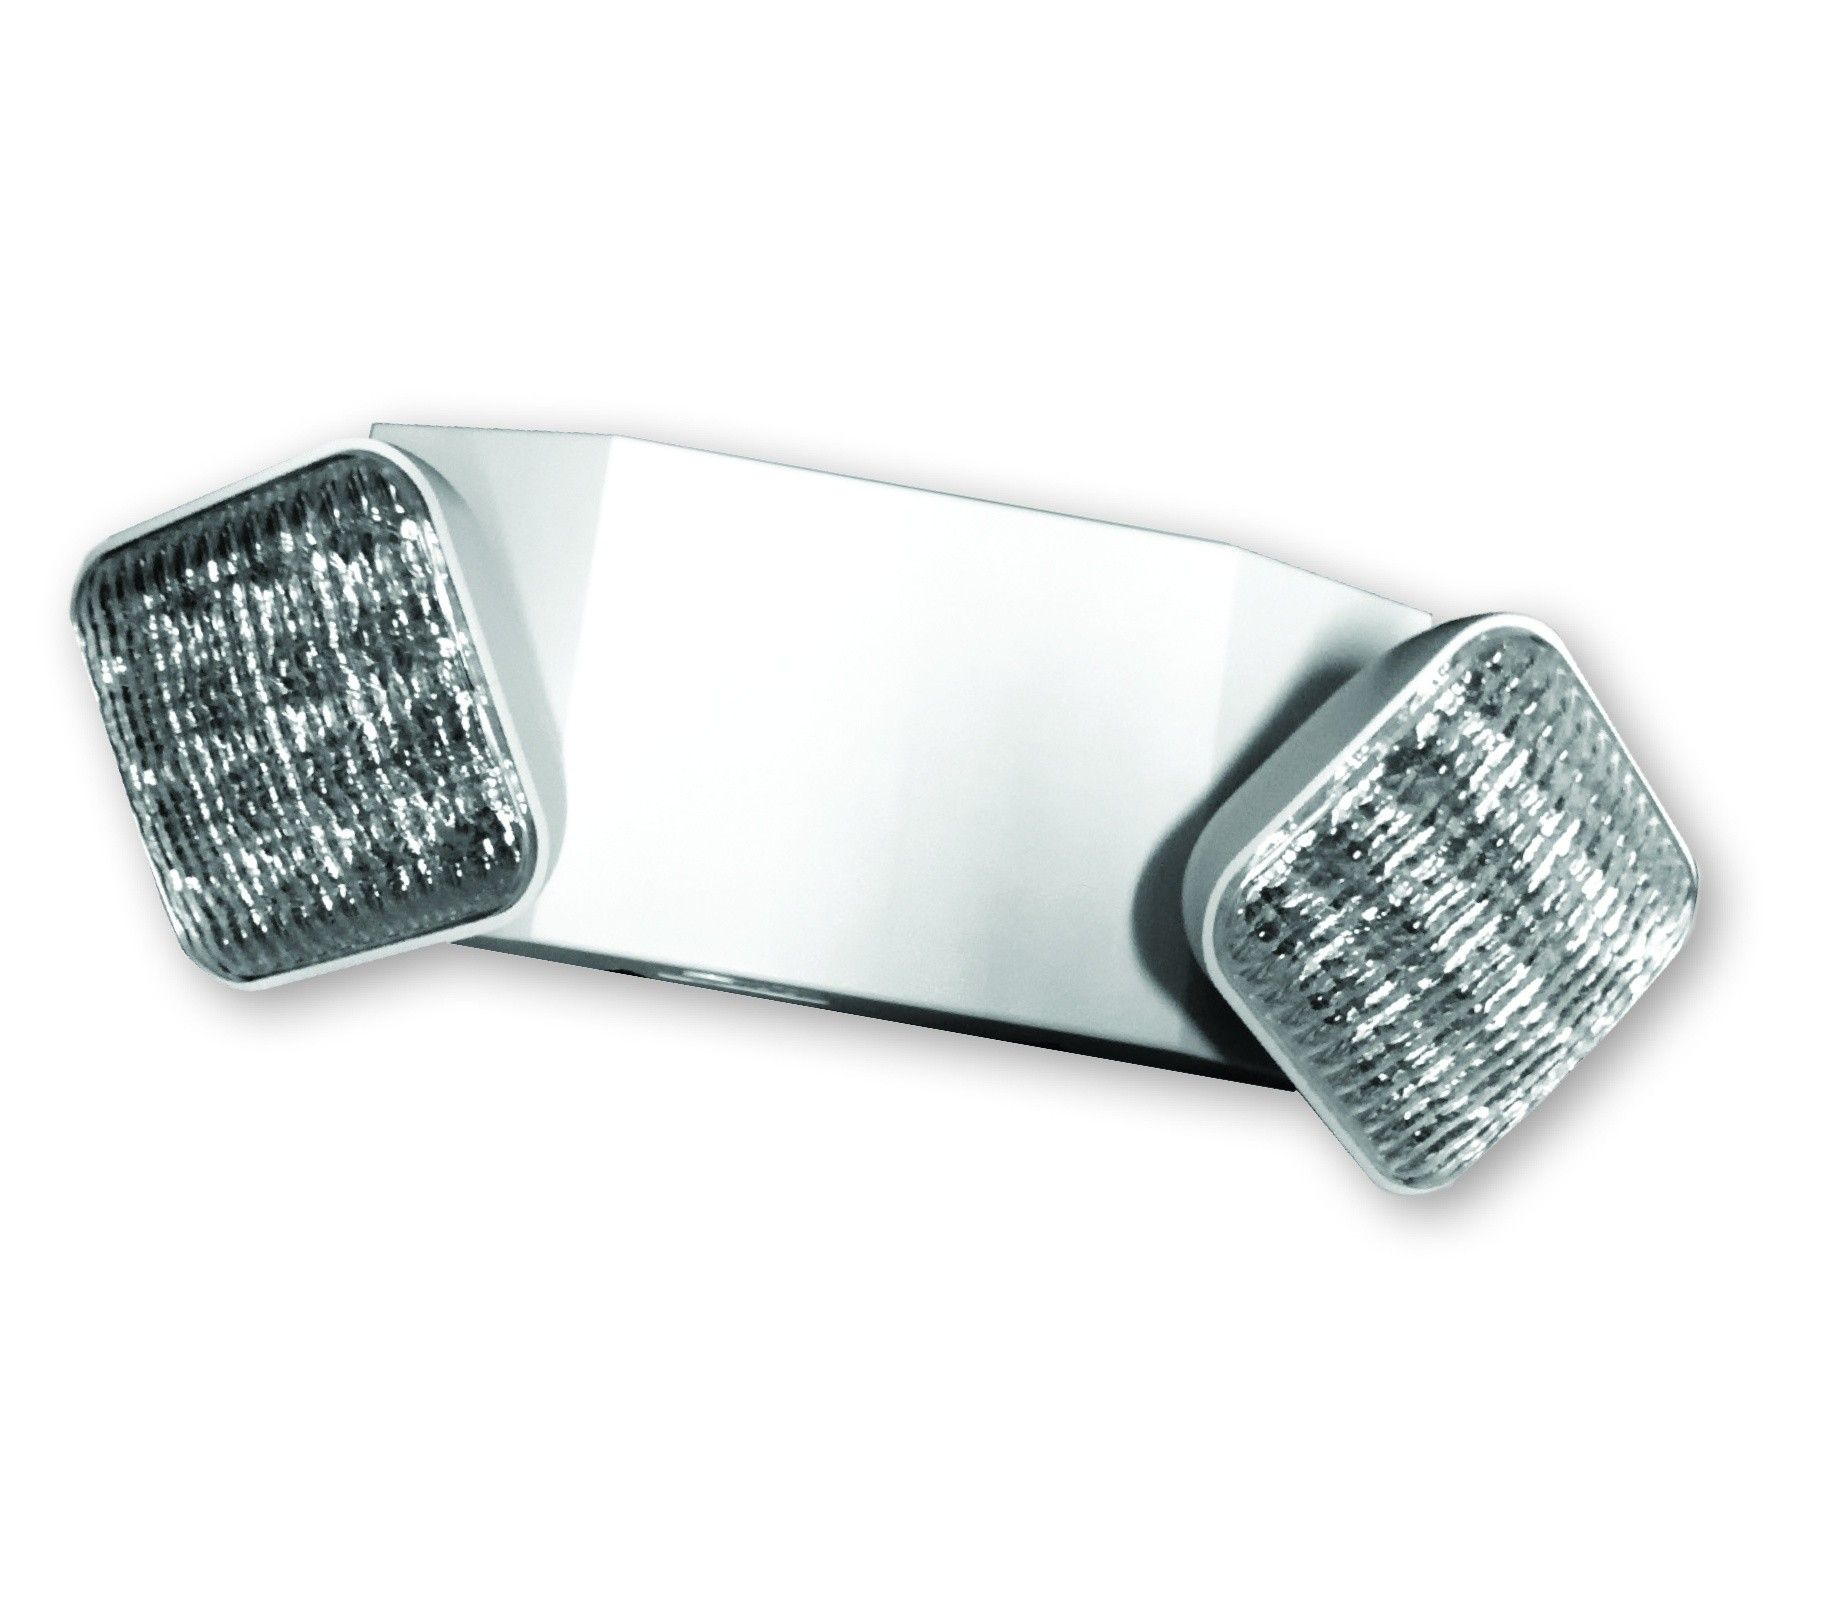 Westgate El 1 Twin Head Led Emergency Light Led Emergency Lights Emergency Lighting Commercial Lighting Fixtures